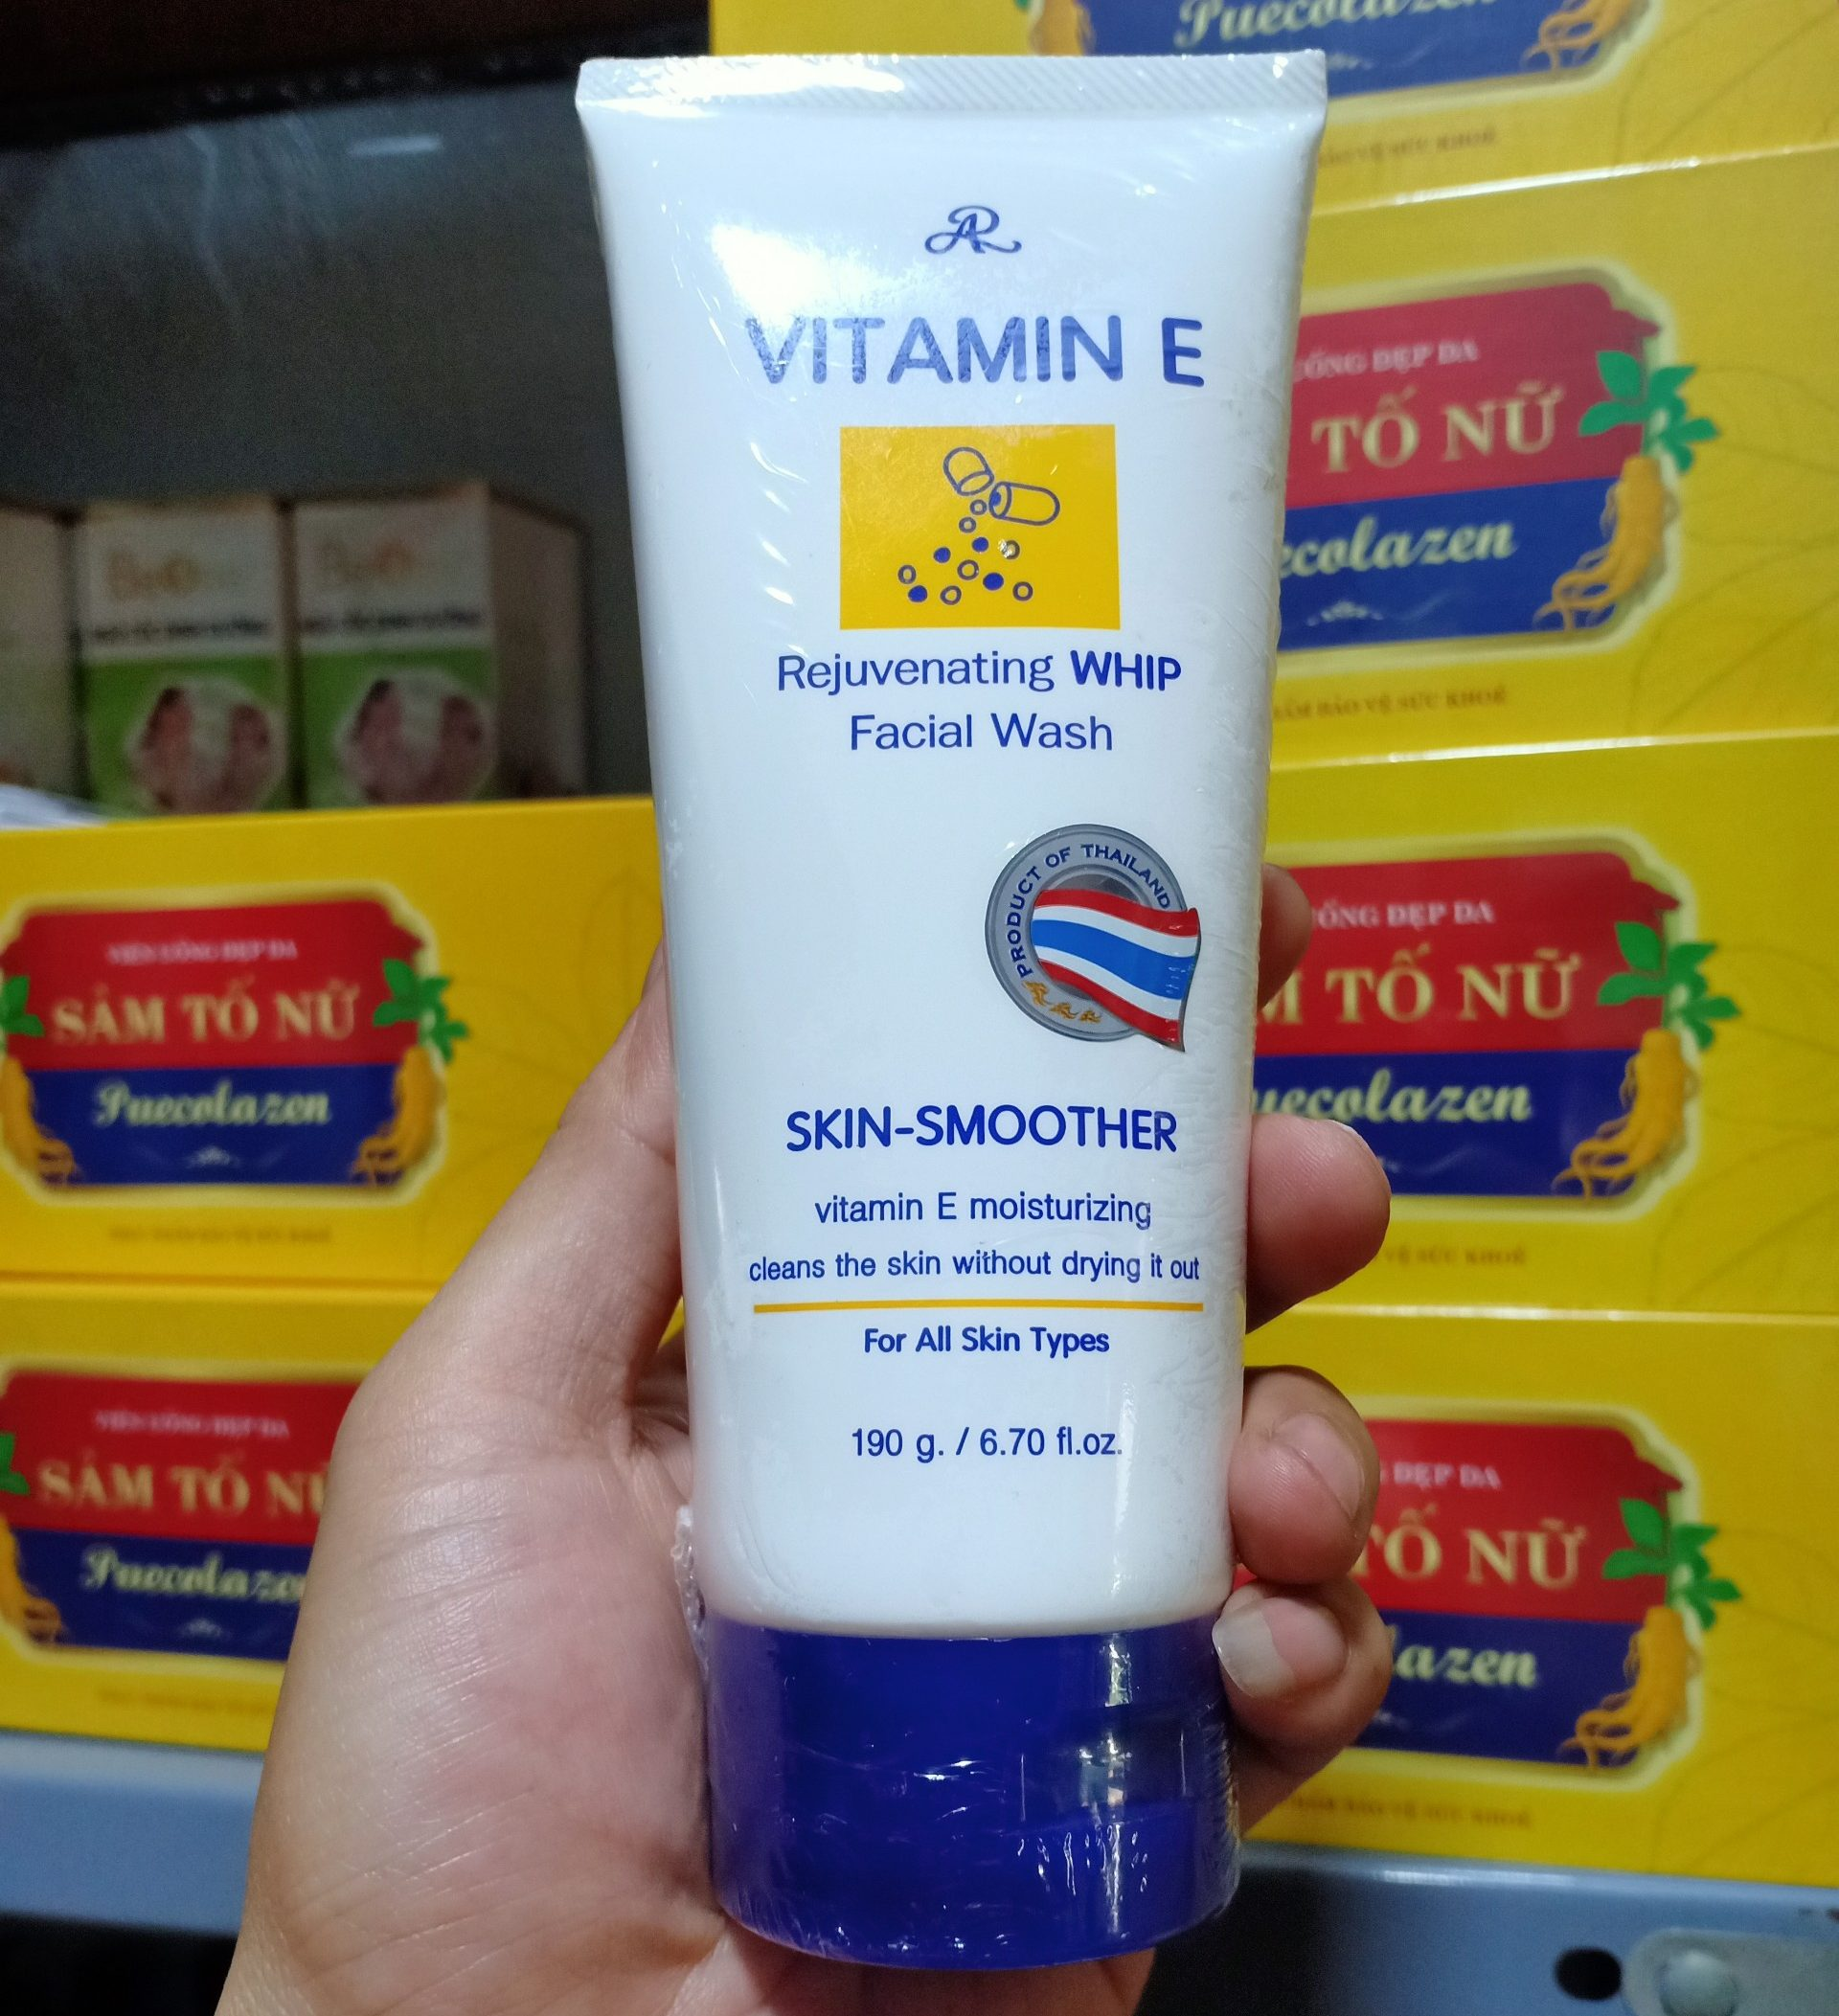 Sữa rửa mặt Vitamin E Moisturizing Whip Facial Wash